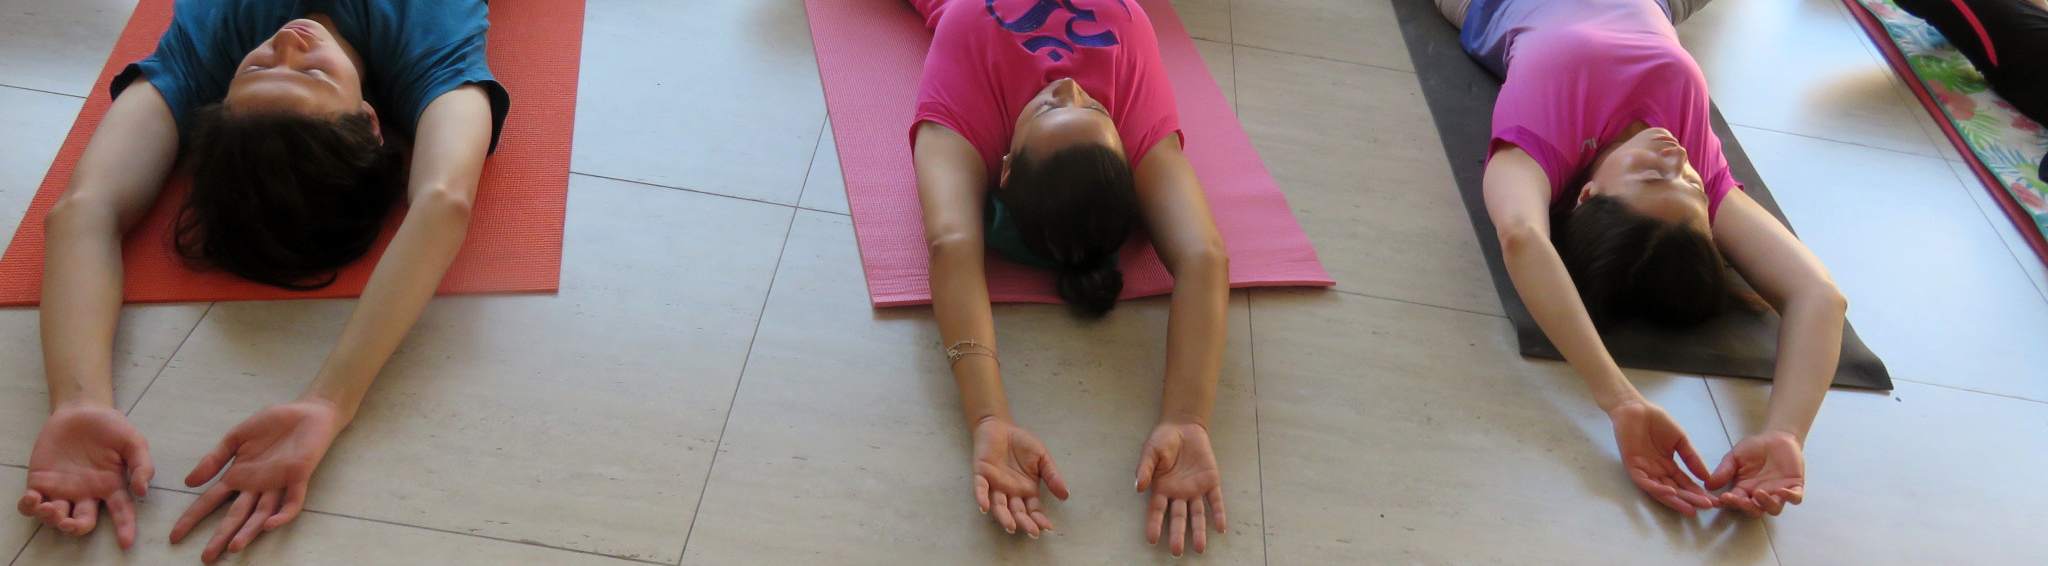 clases-de-yoga-bogota-1